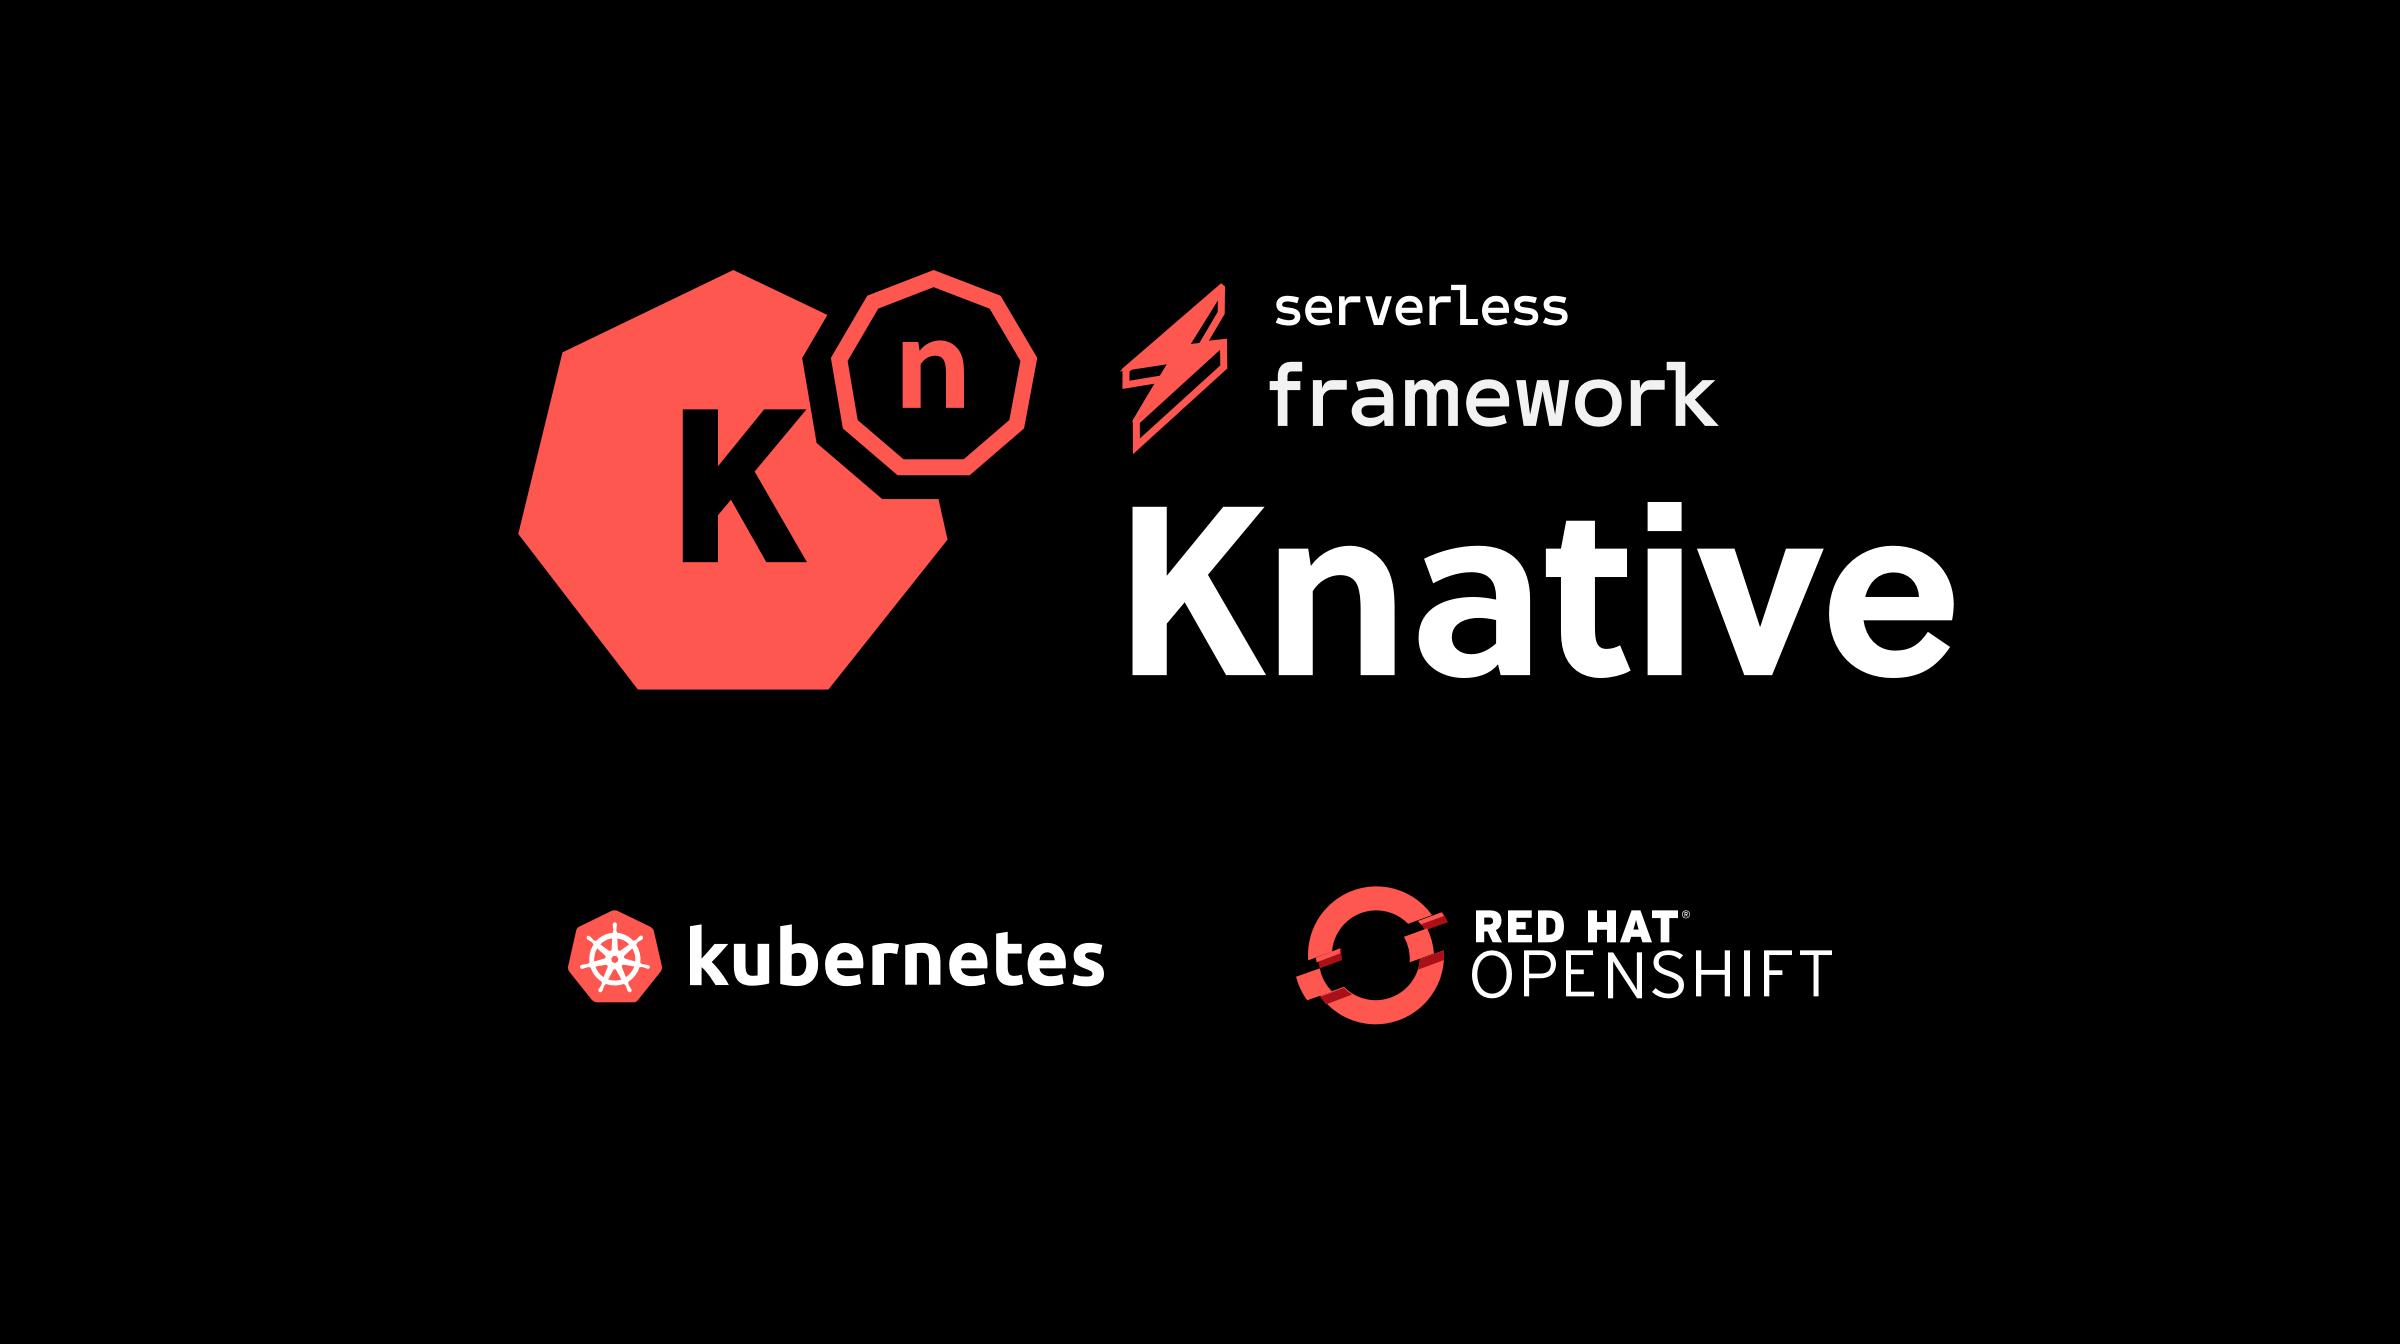 Serverless Framework Knative Component